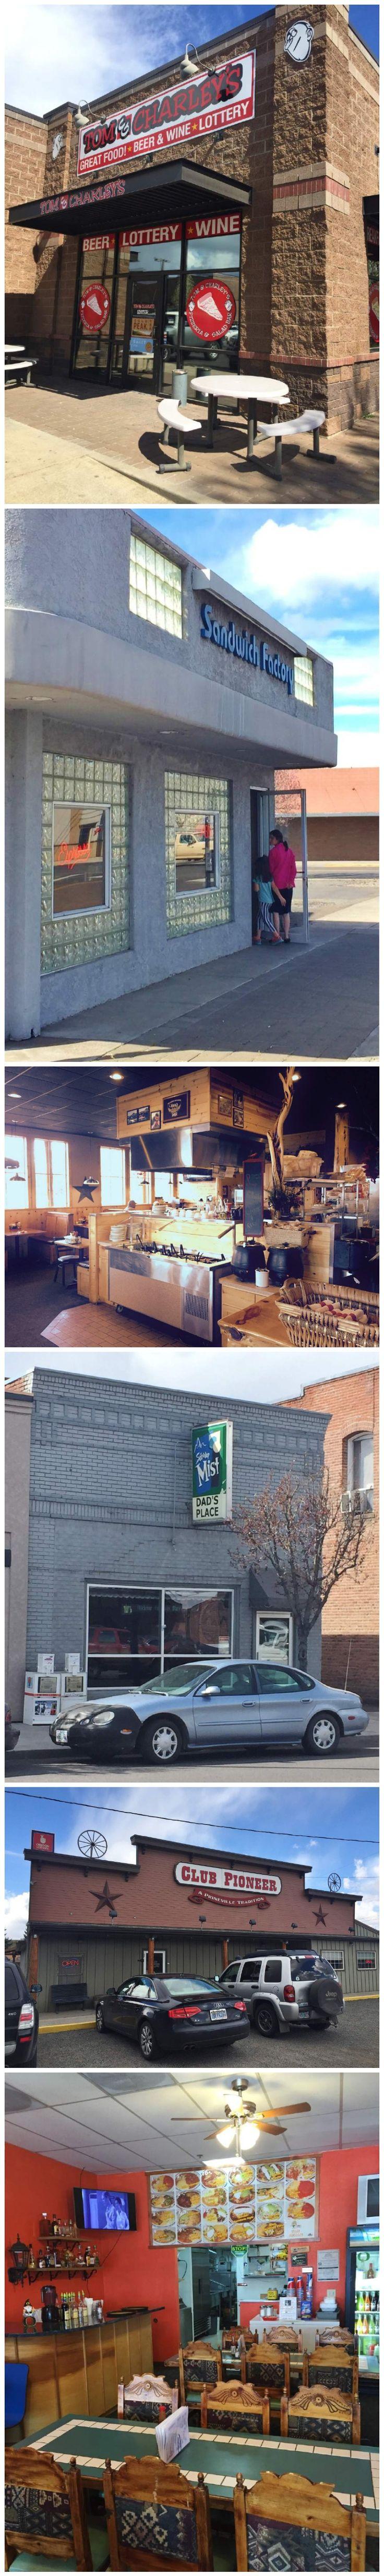 17 best images about central oregon restaurants on for Primal kitchen south bend